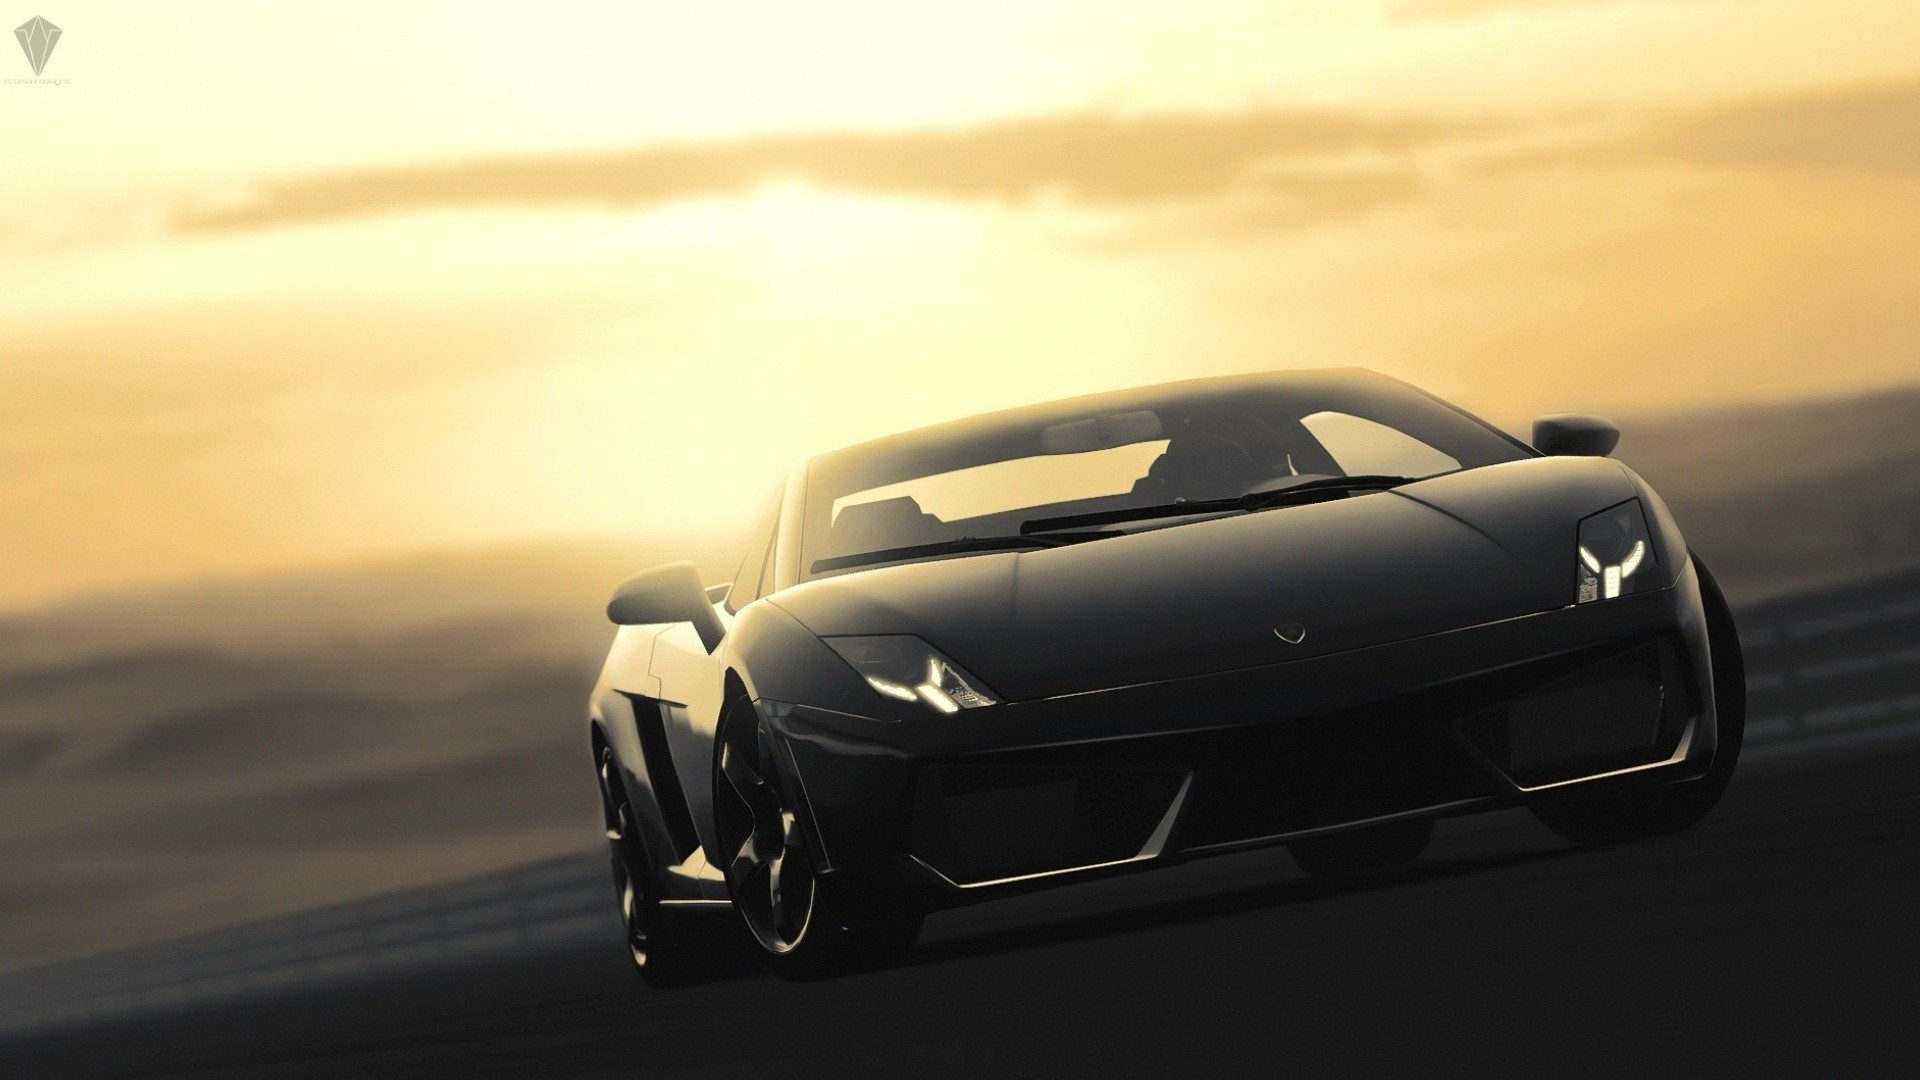 Lamborghini Gallardo Fonds d'écran, Arrières-plan ...